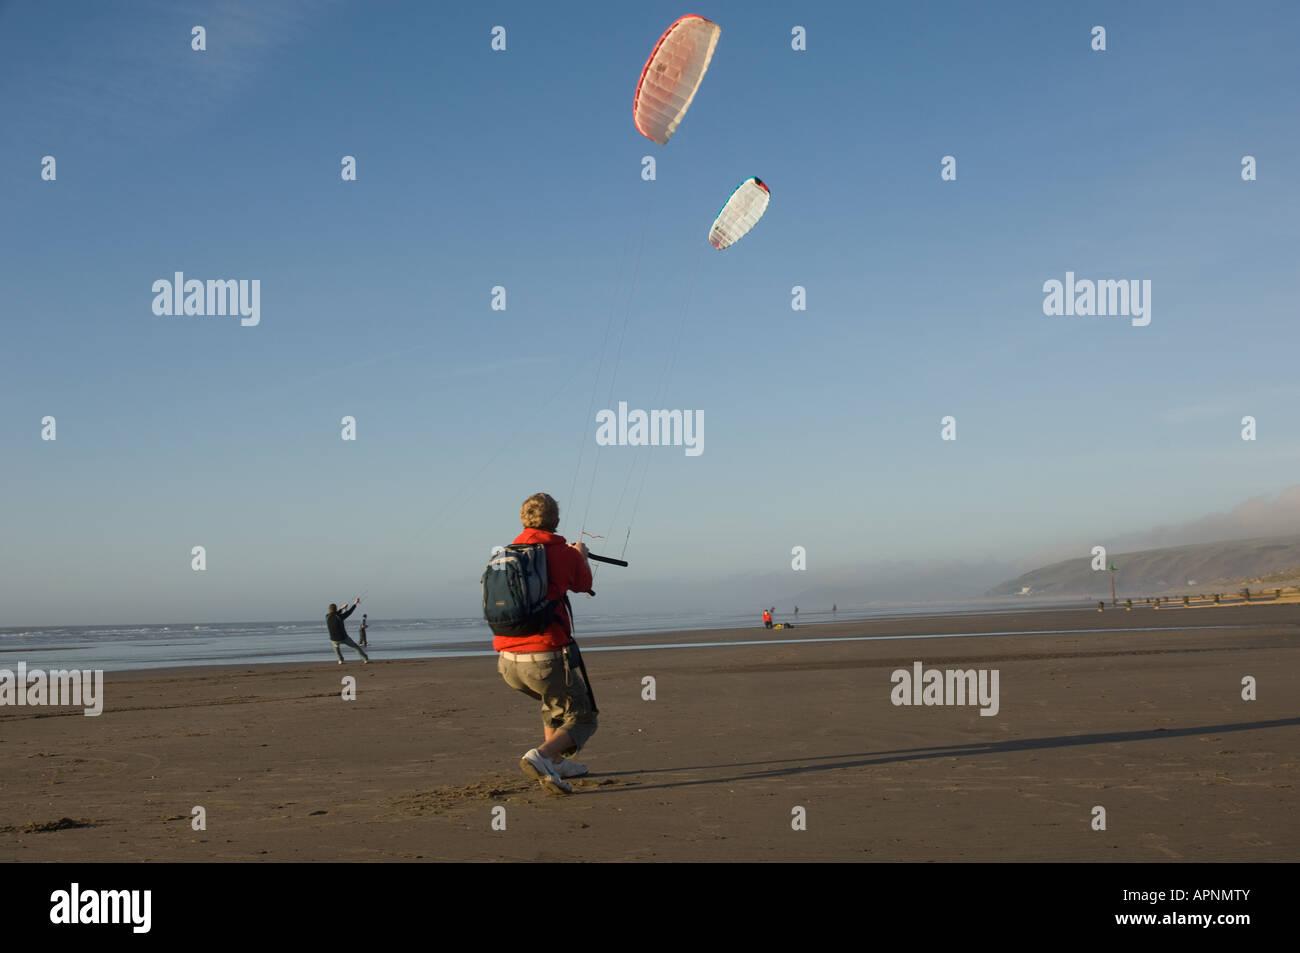 man person Powerkite kite flying Ynyslas Borth beach west wales UK January afternoon - Stock Image